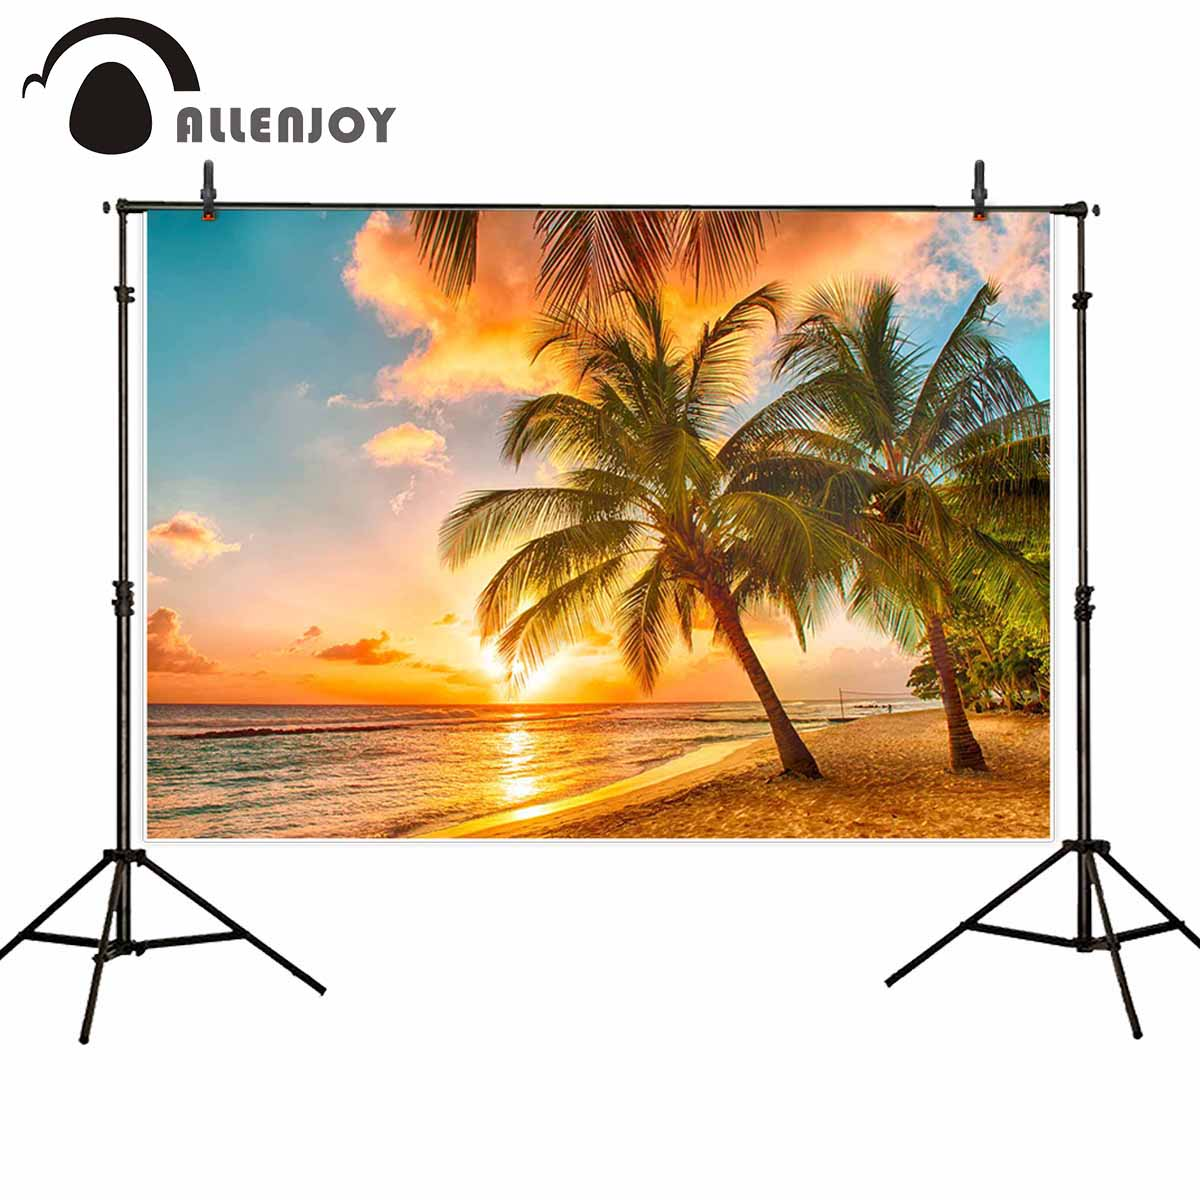 Allenjoy backgrounds for photography studio beautiful sunset sea palms trees beach caribbean island backdrop summer photocall